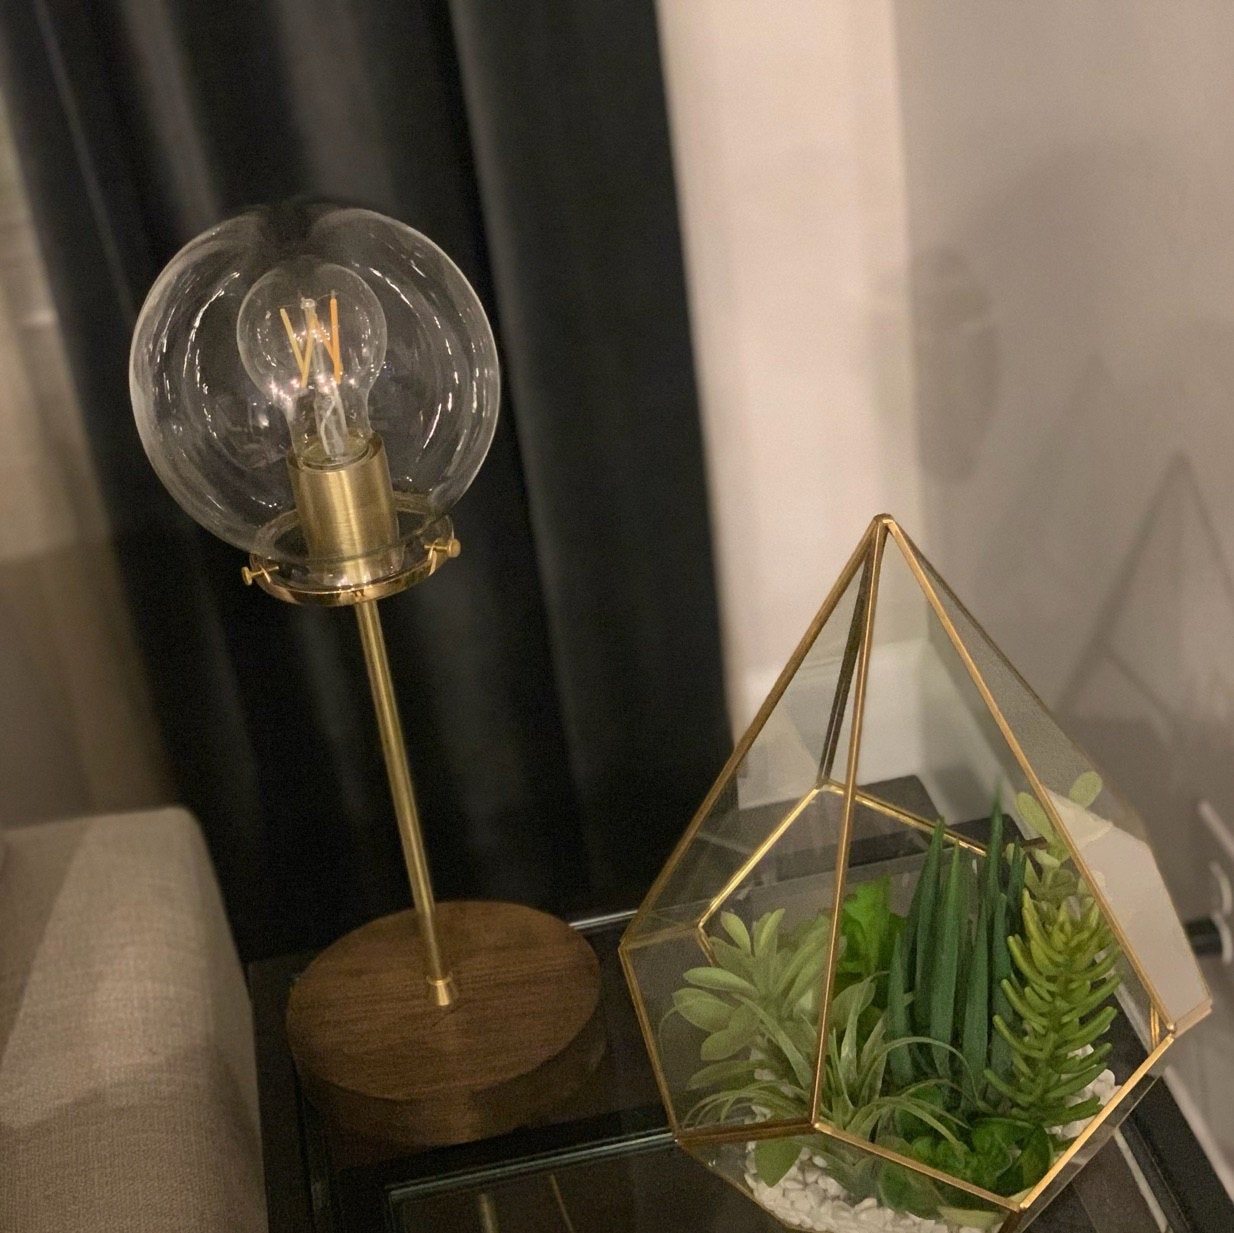 Espiral Mason Jar Chandelier, Accesorio de iluminación colgante rústico, 8 tarros claros, iluminación moderna BootsNGus & home decor, bombillas incluidas #jarchandelier